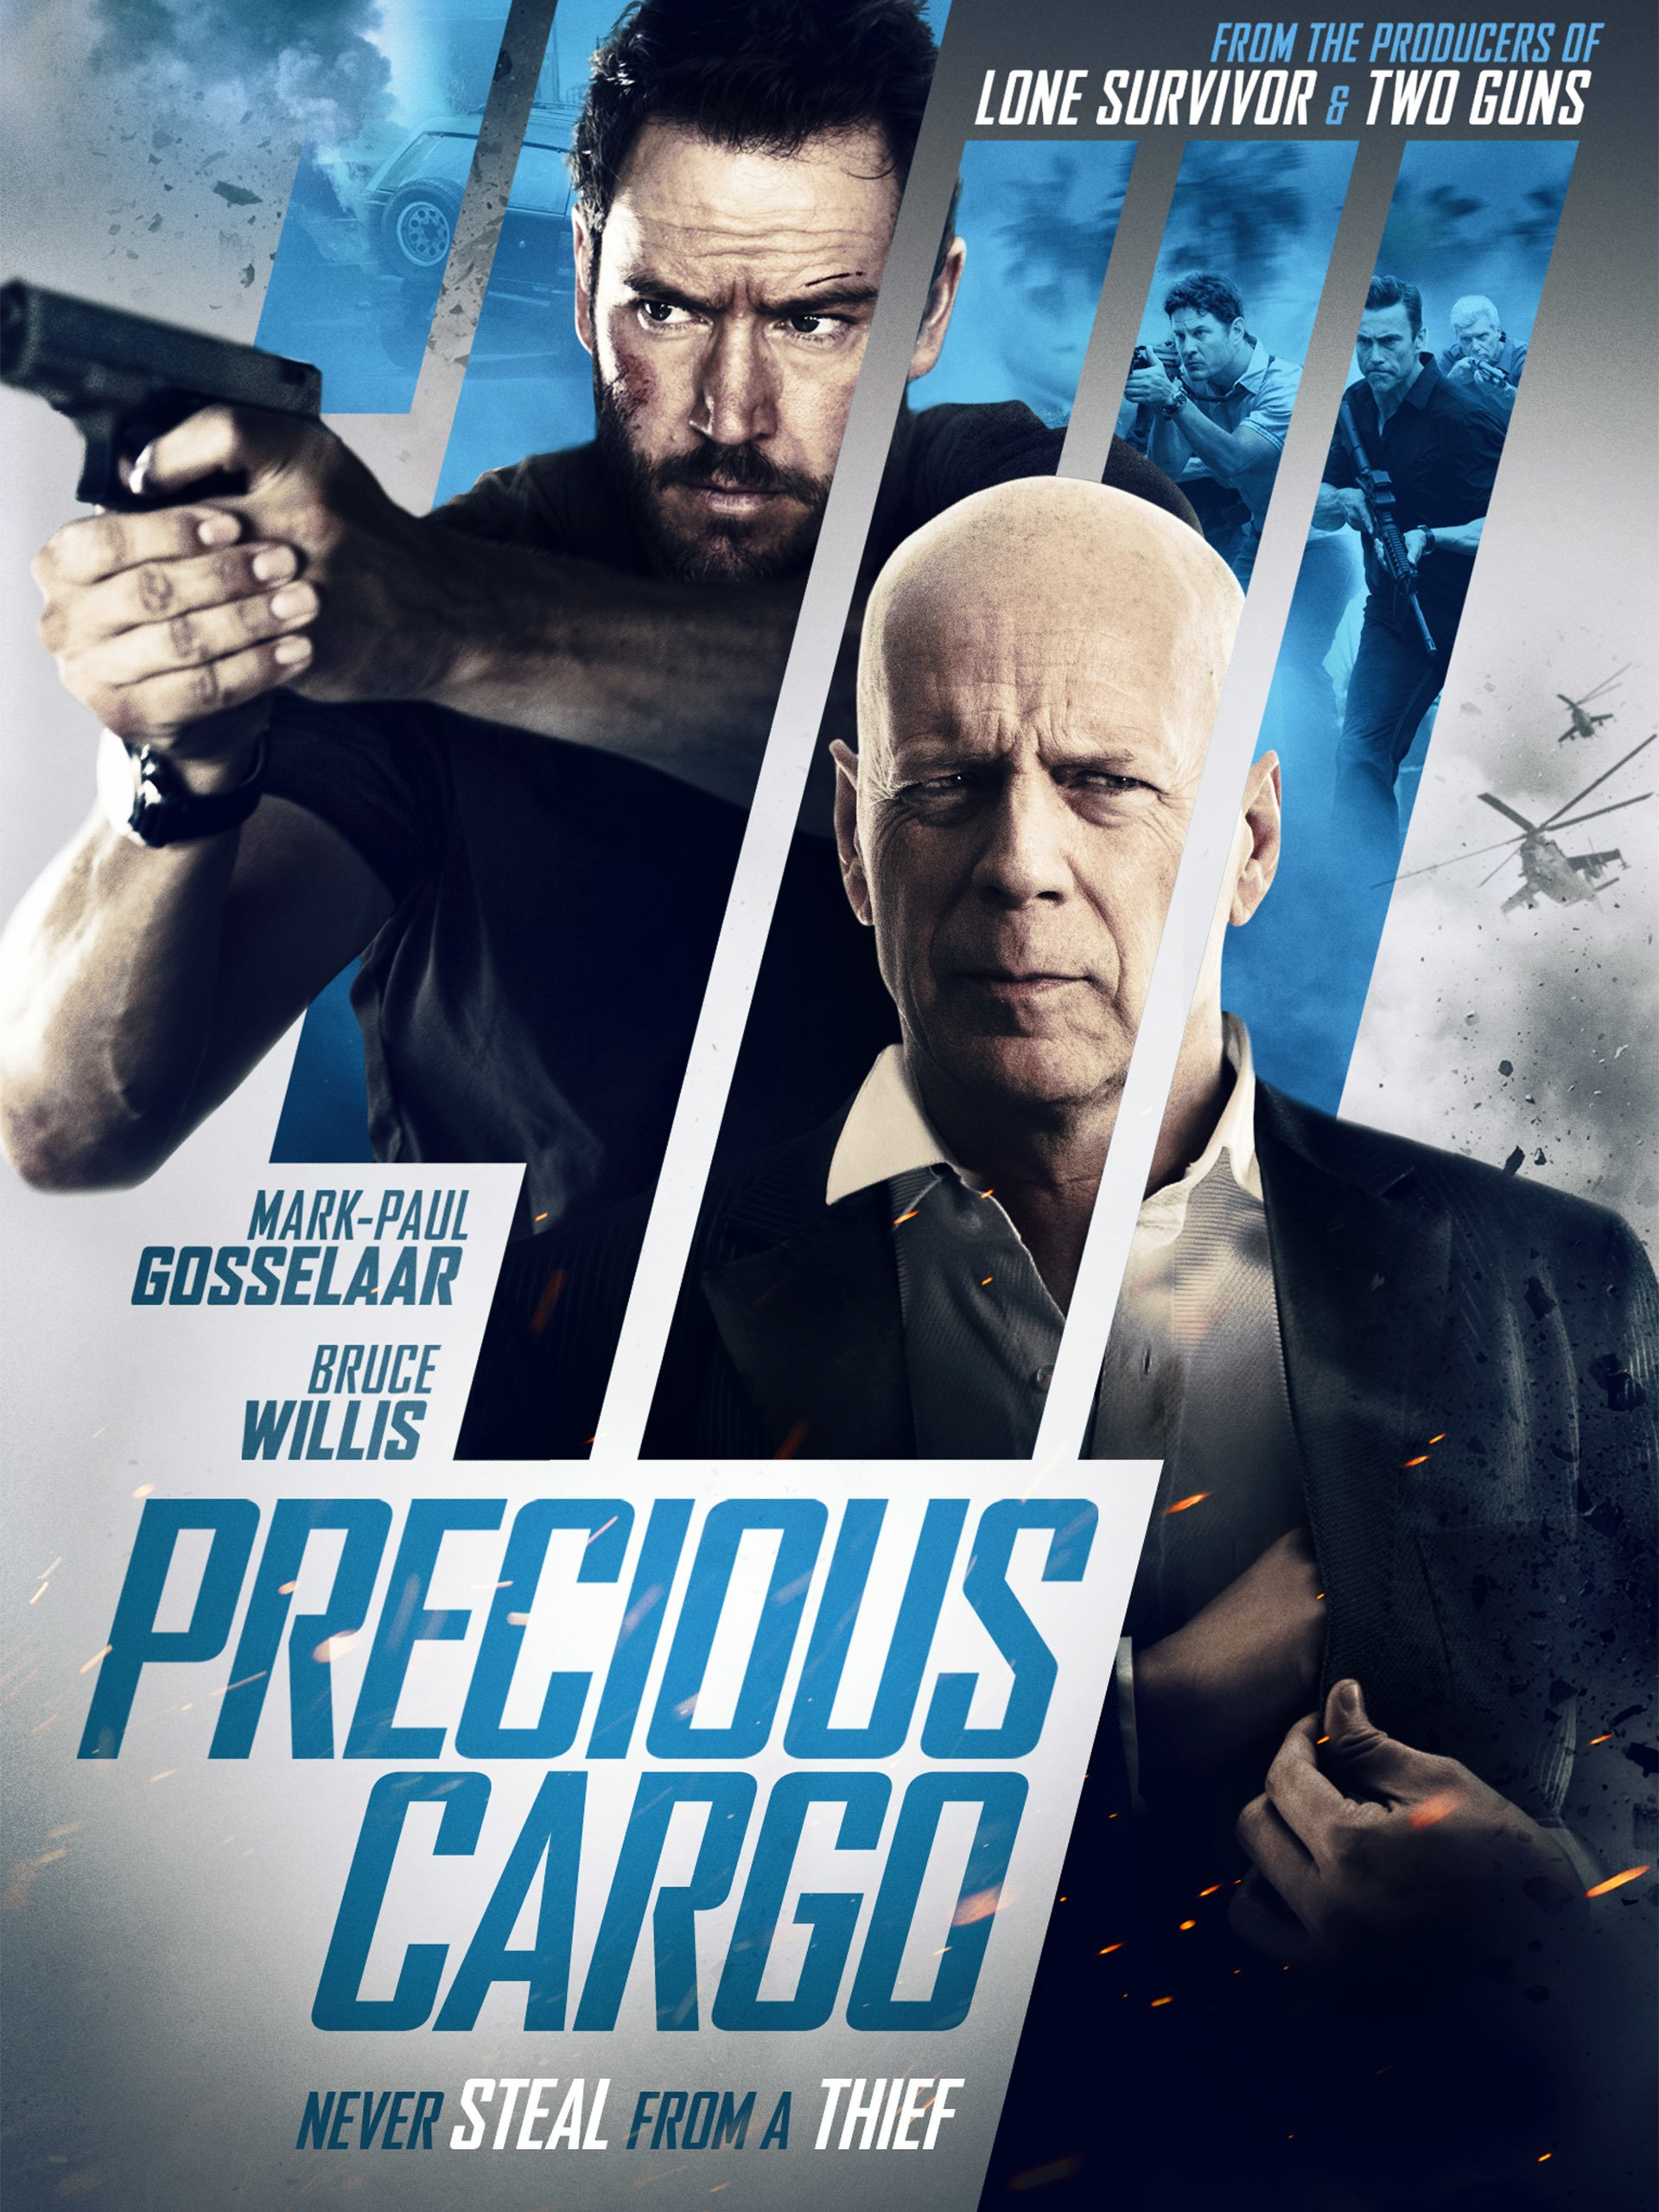 Watch 'Precious Cargo' on Amazon Prime Video UK